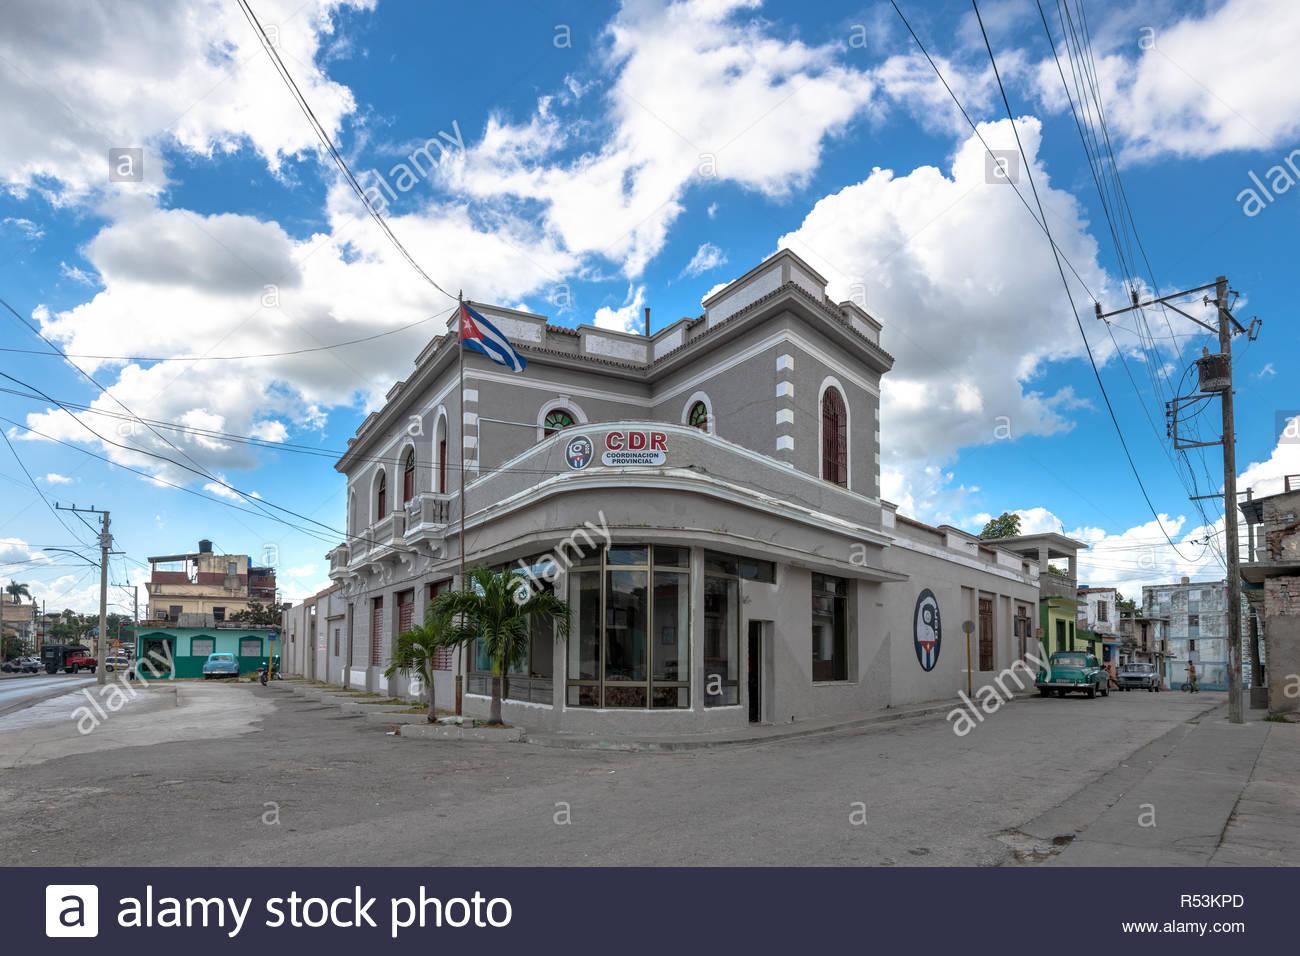 Santa Clara, Villa Clara, Cuba-November 4, 2018:  The Provincial Headquarters of the CDR ( Revolution Defense Committee). Wide angle view - Stock Image